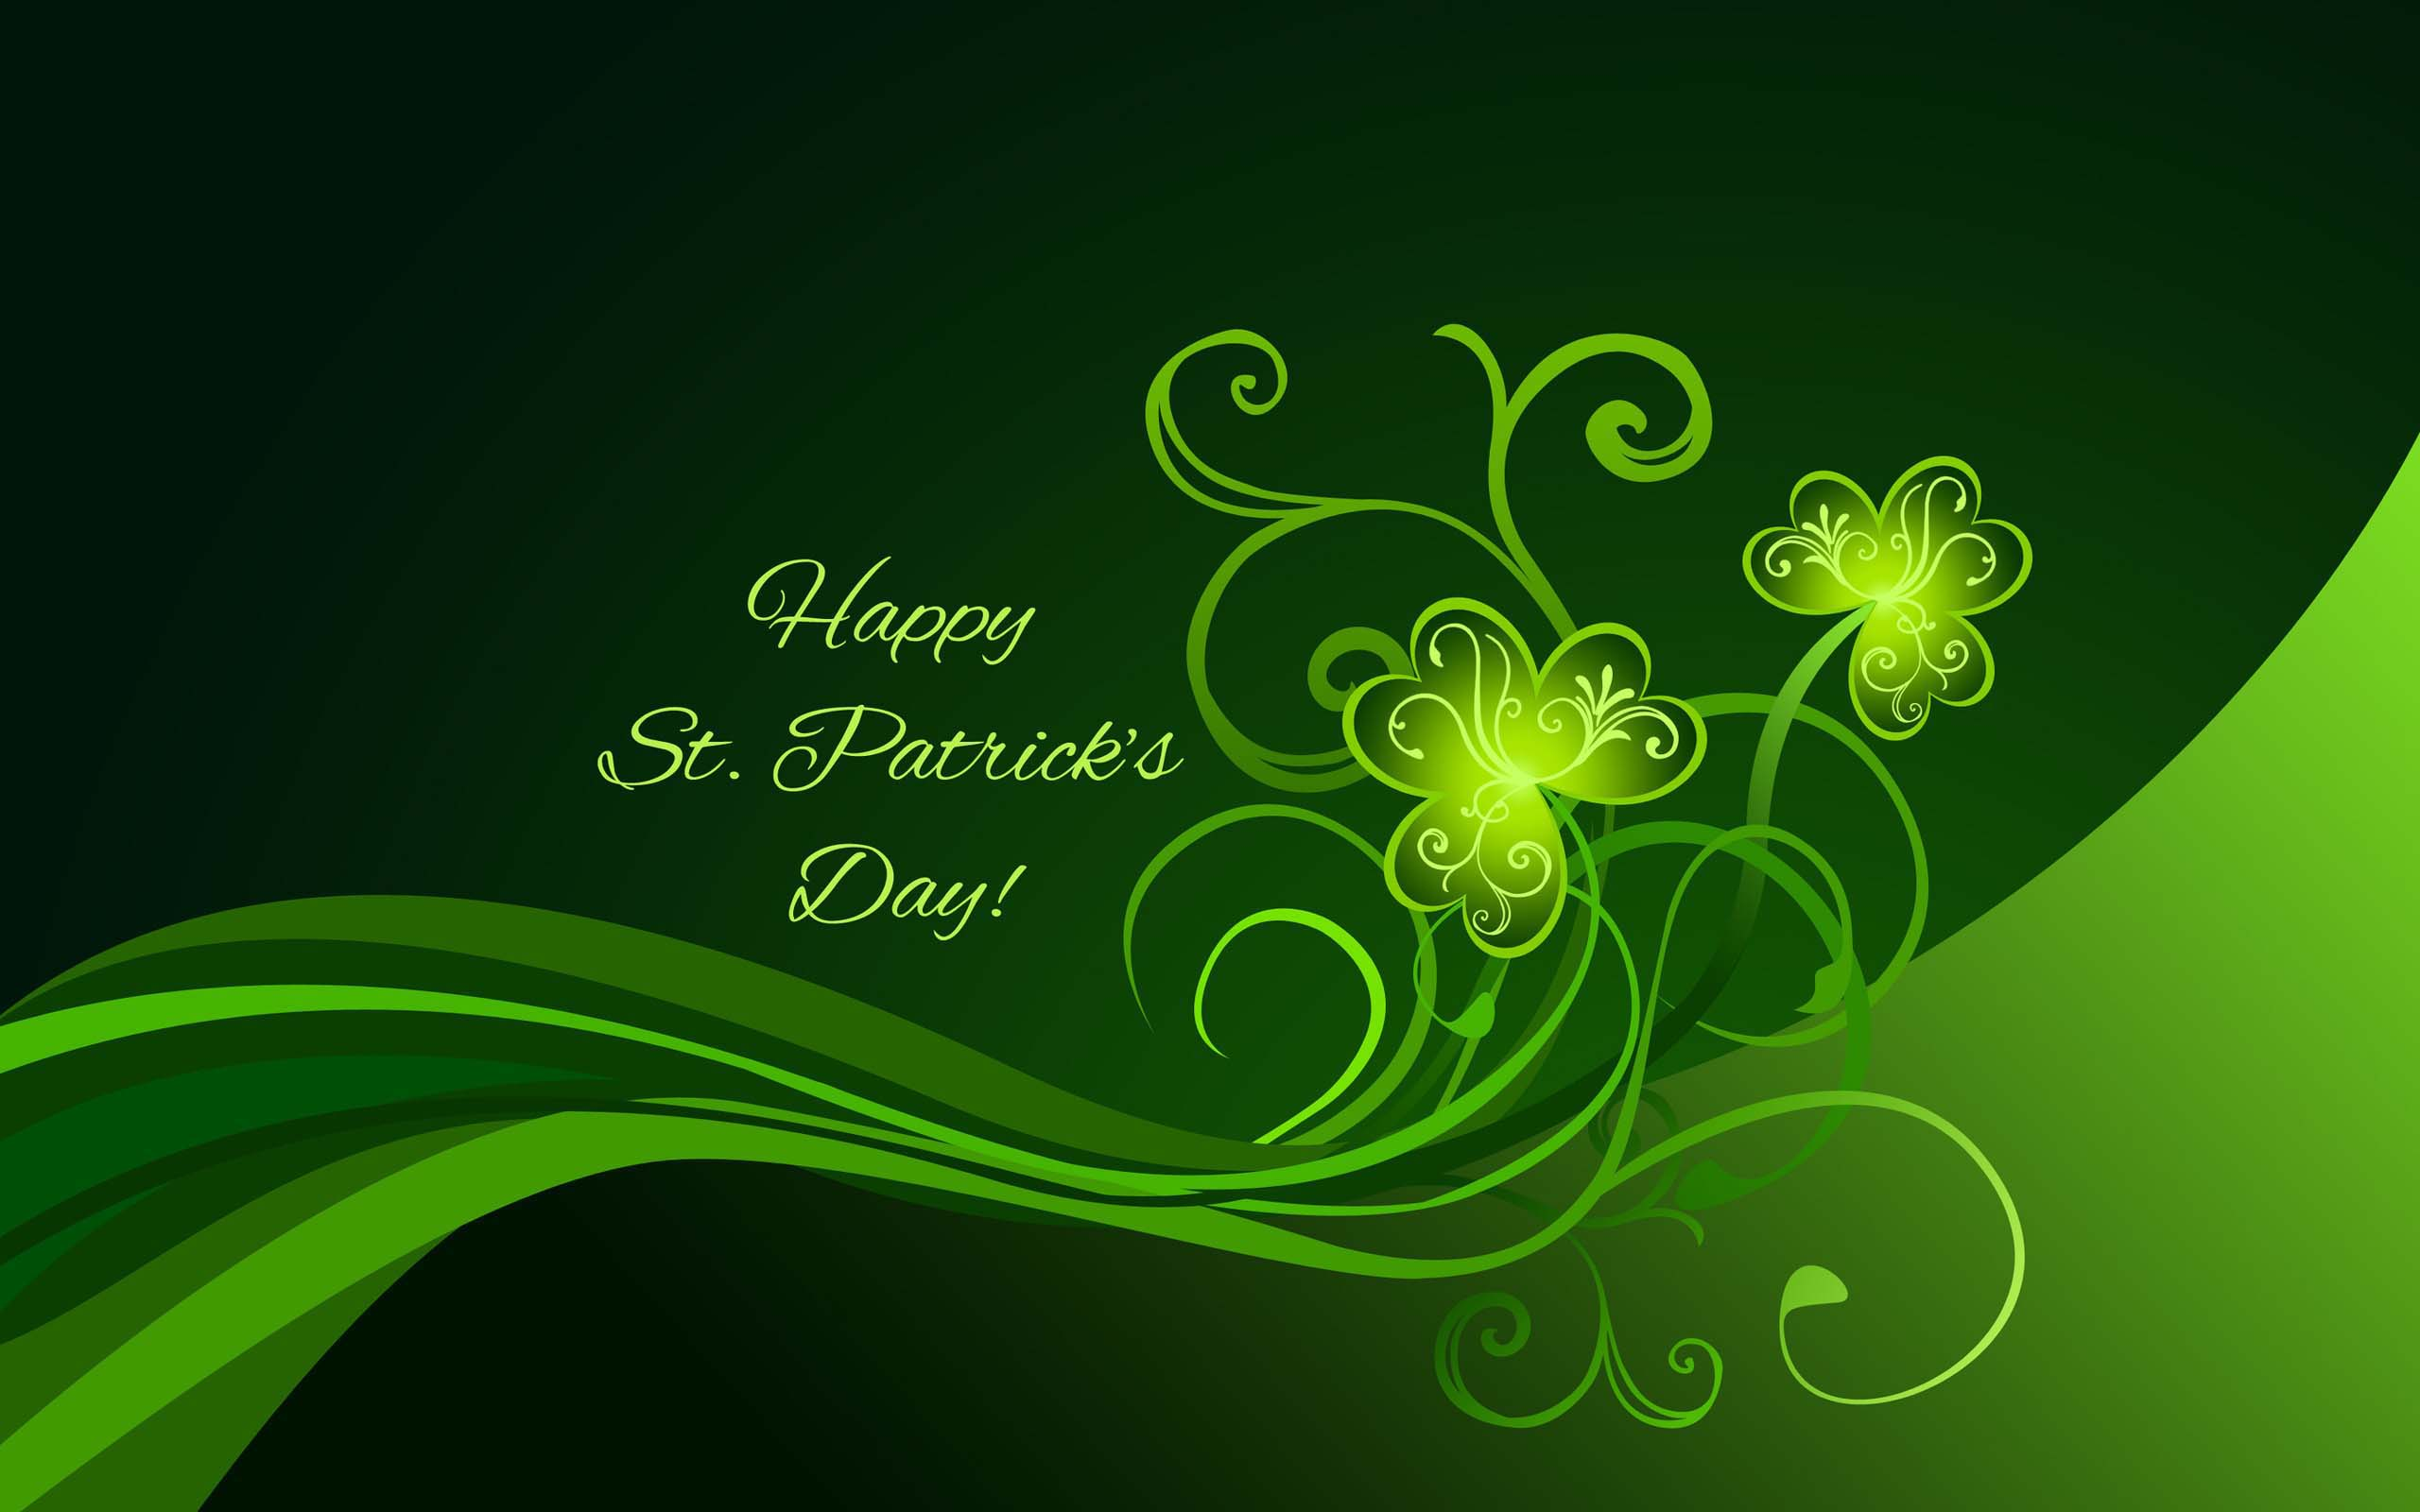 St Patricks Day HD Wallpaper Wide Screen Wallpaper 2560x1600